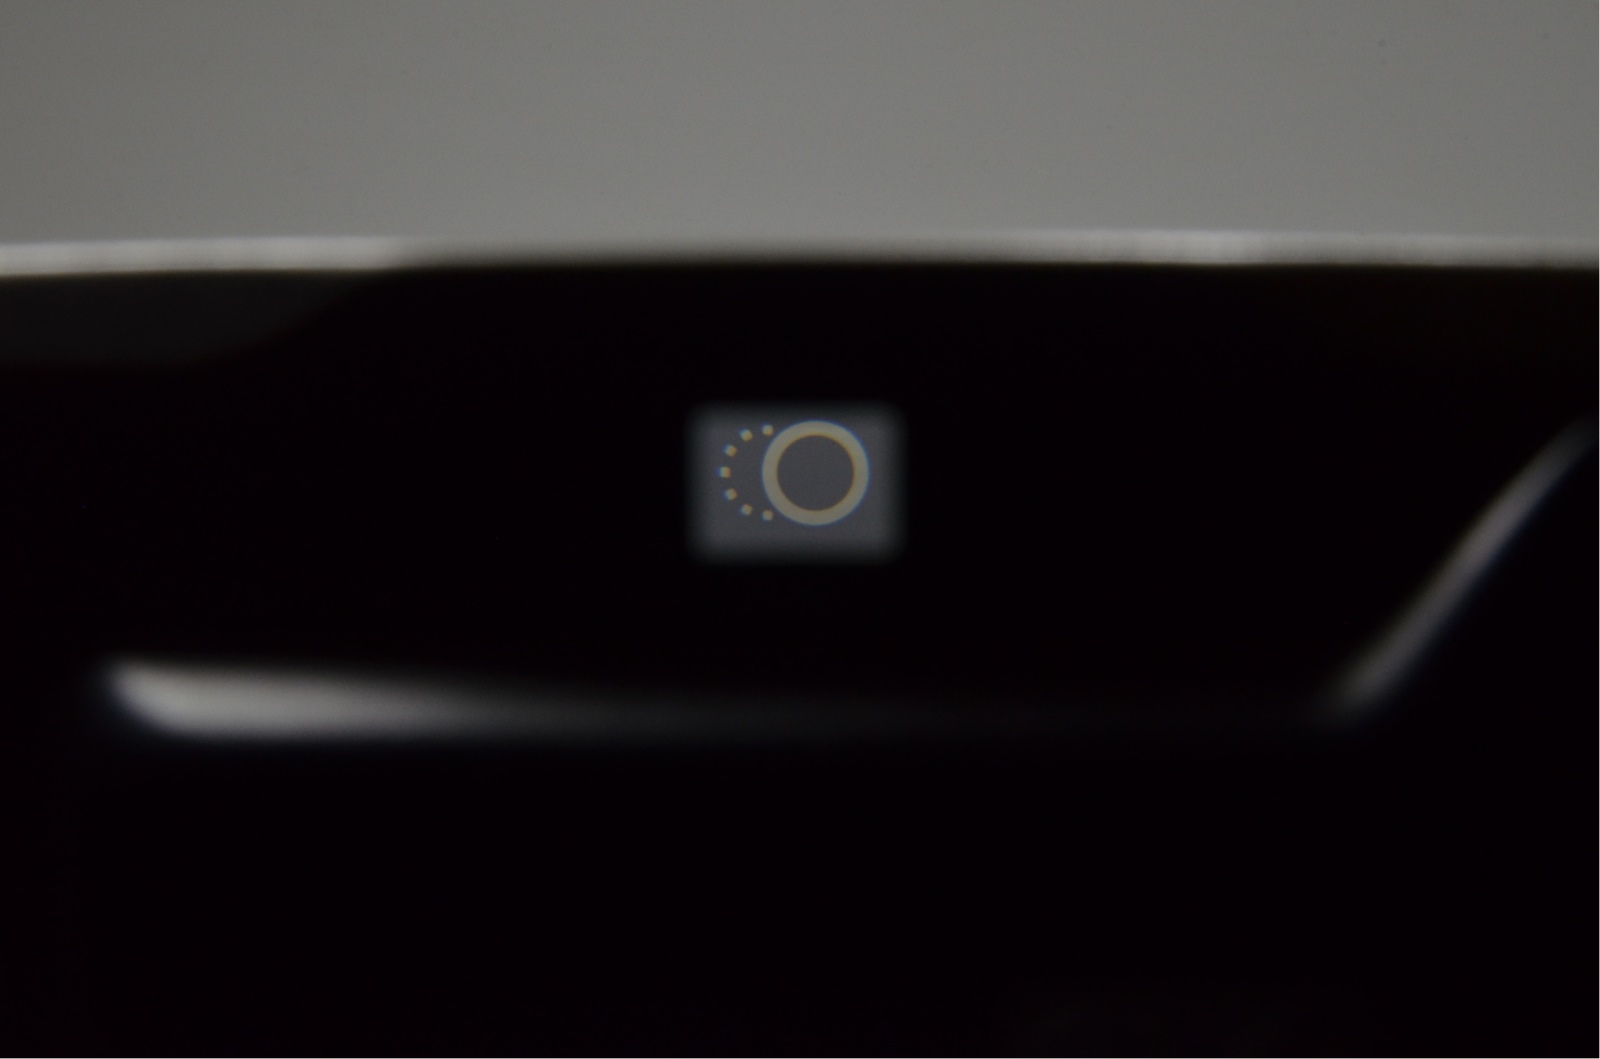 contax t2 data back titanium black in boxed 35mm film camera